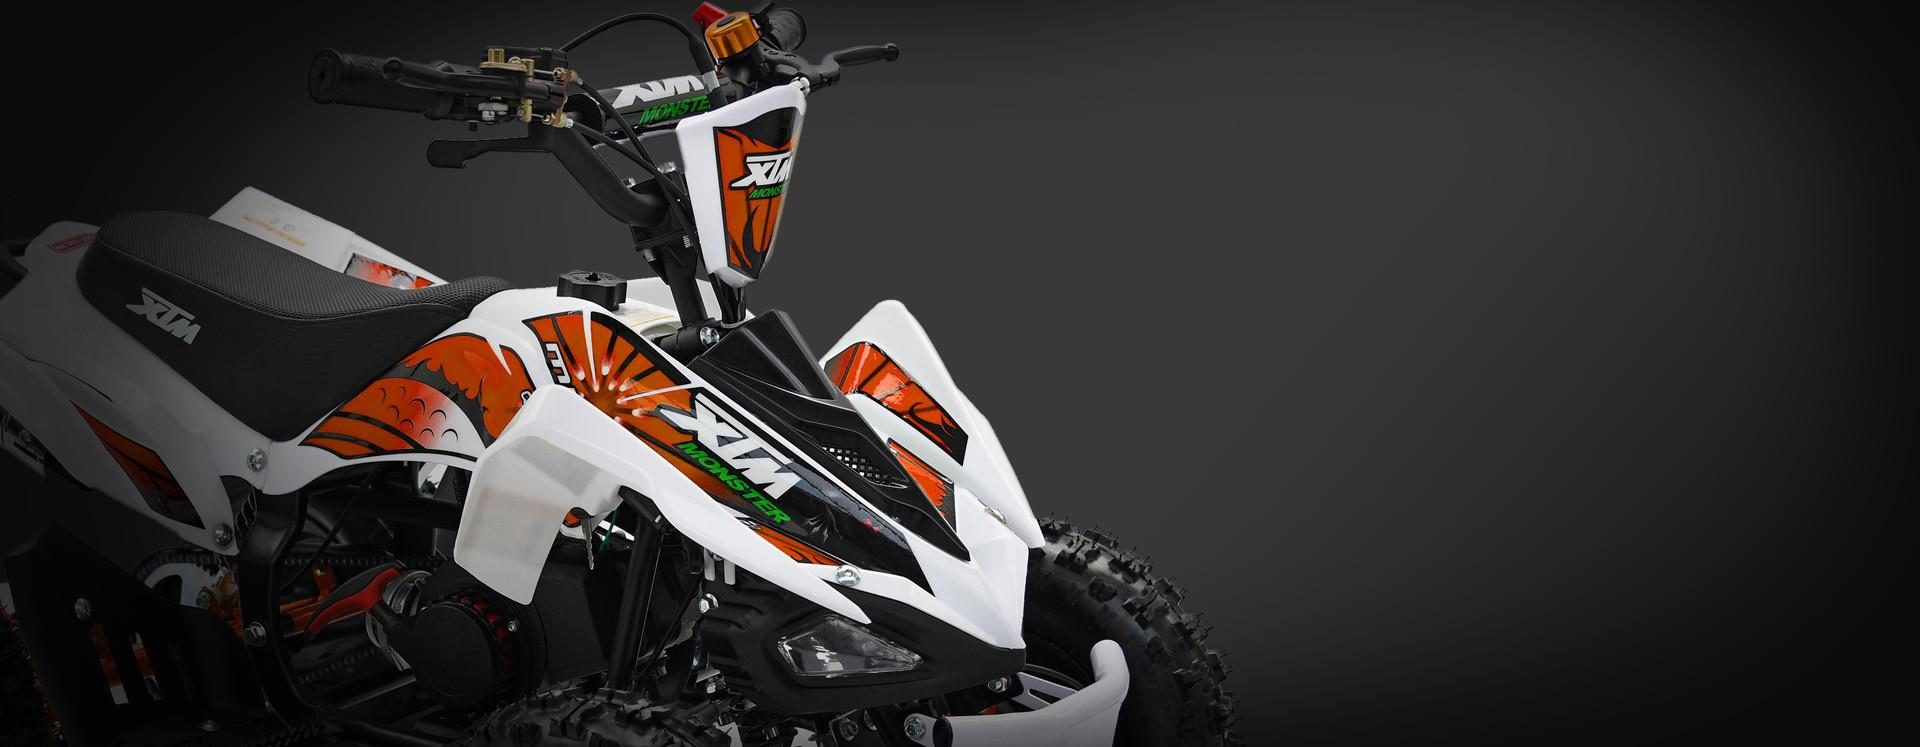 XTM MONSTER 50cc QUAD BIKE WHITE ORANGE